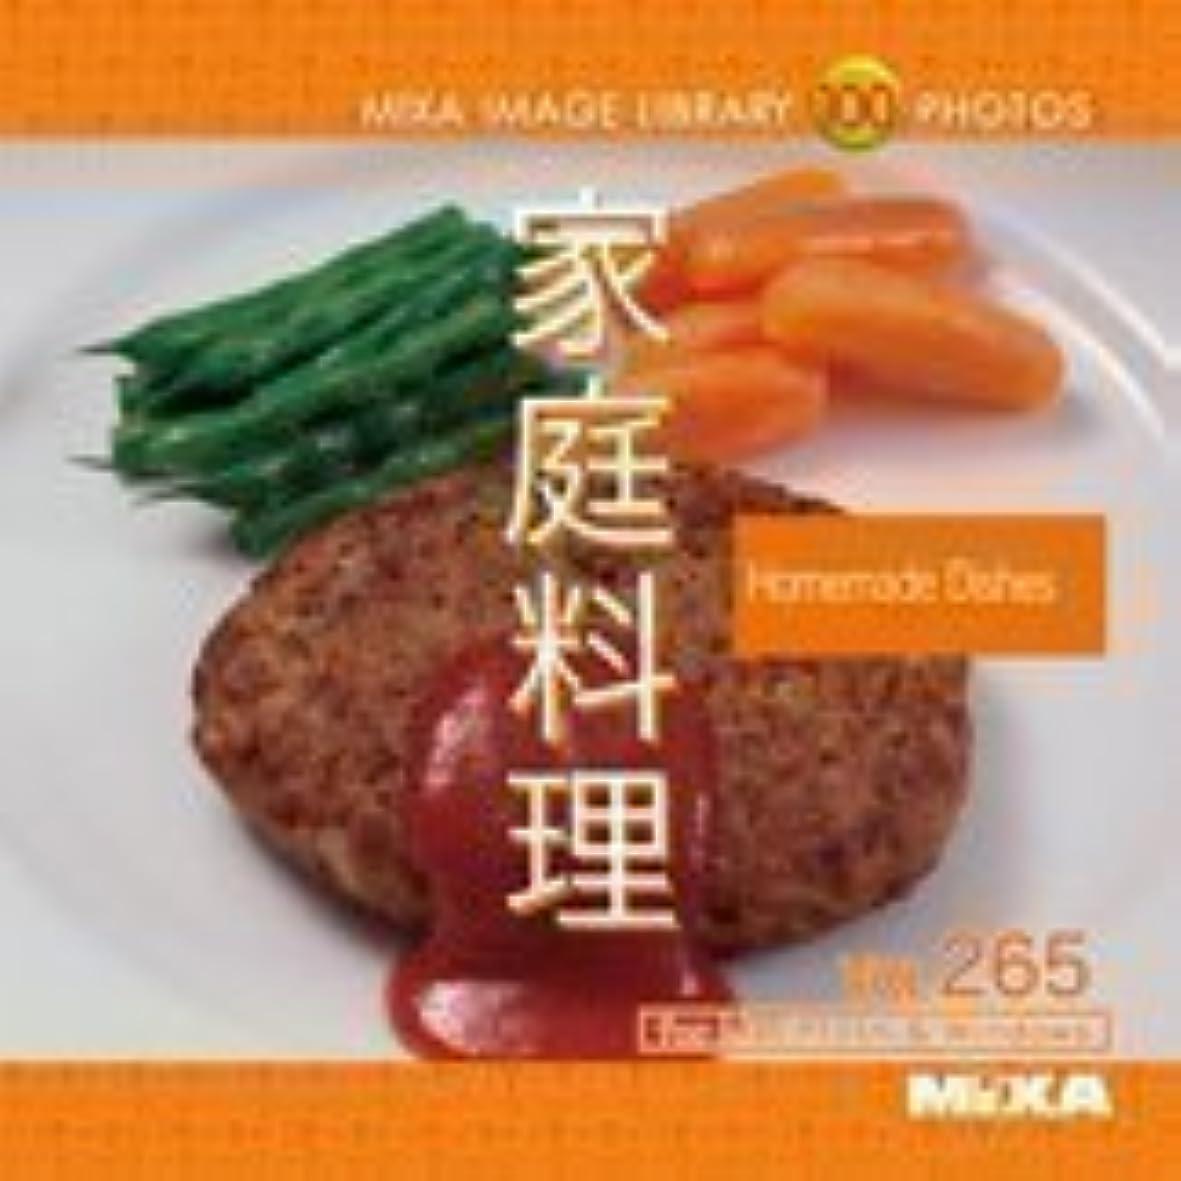 残基販売員症候群MIXA IMAGE LIBRARY Vol.265 家庭料理